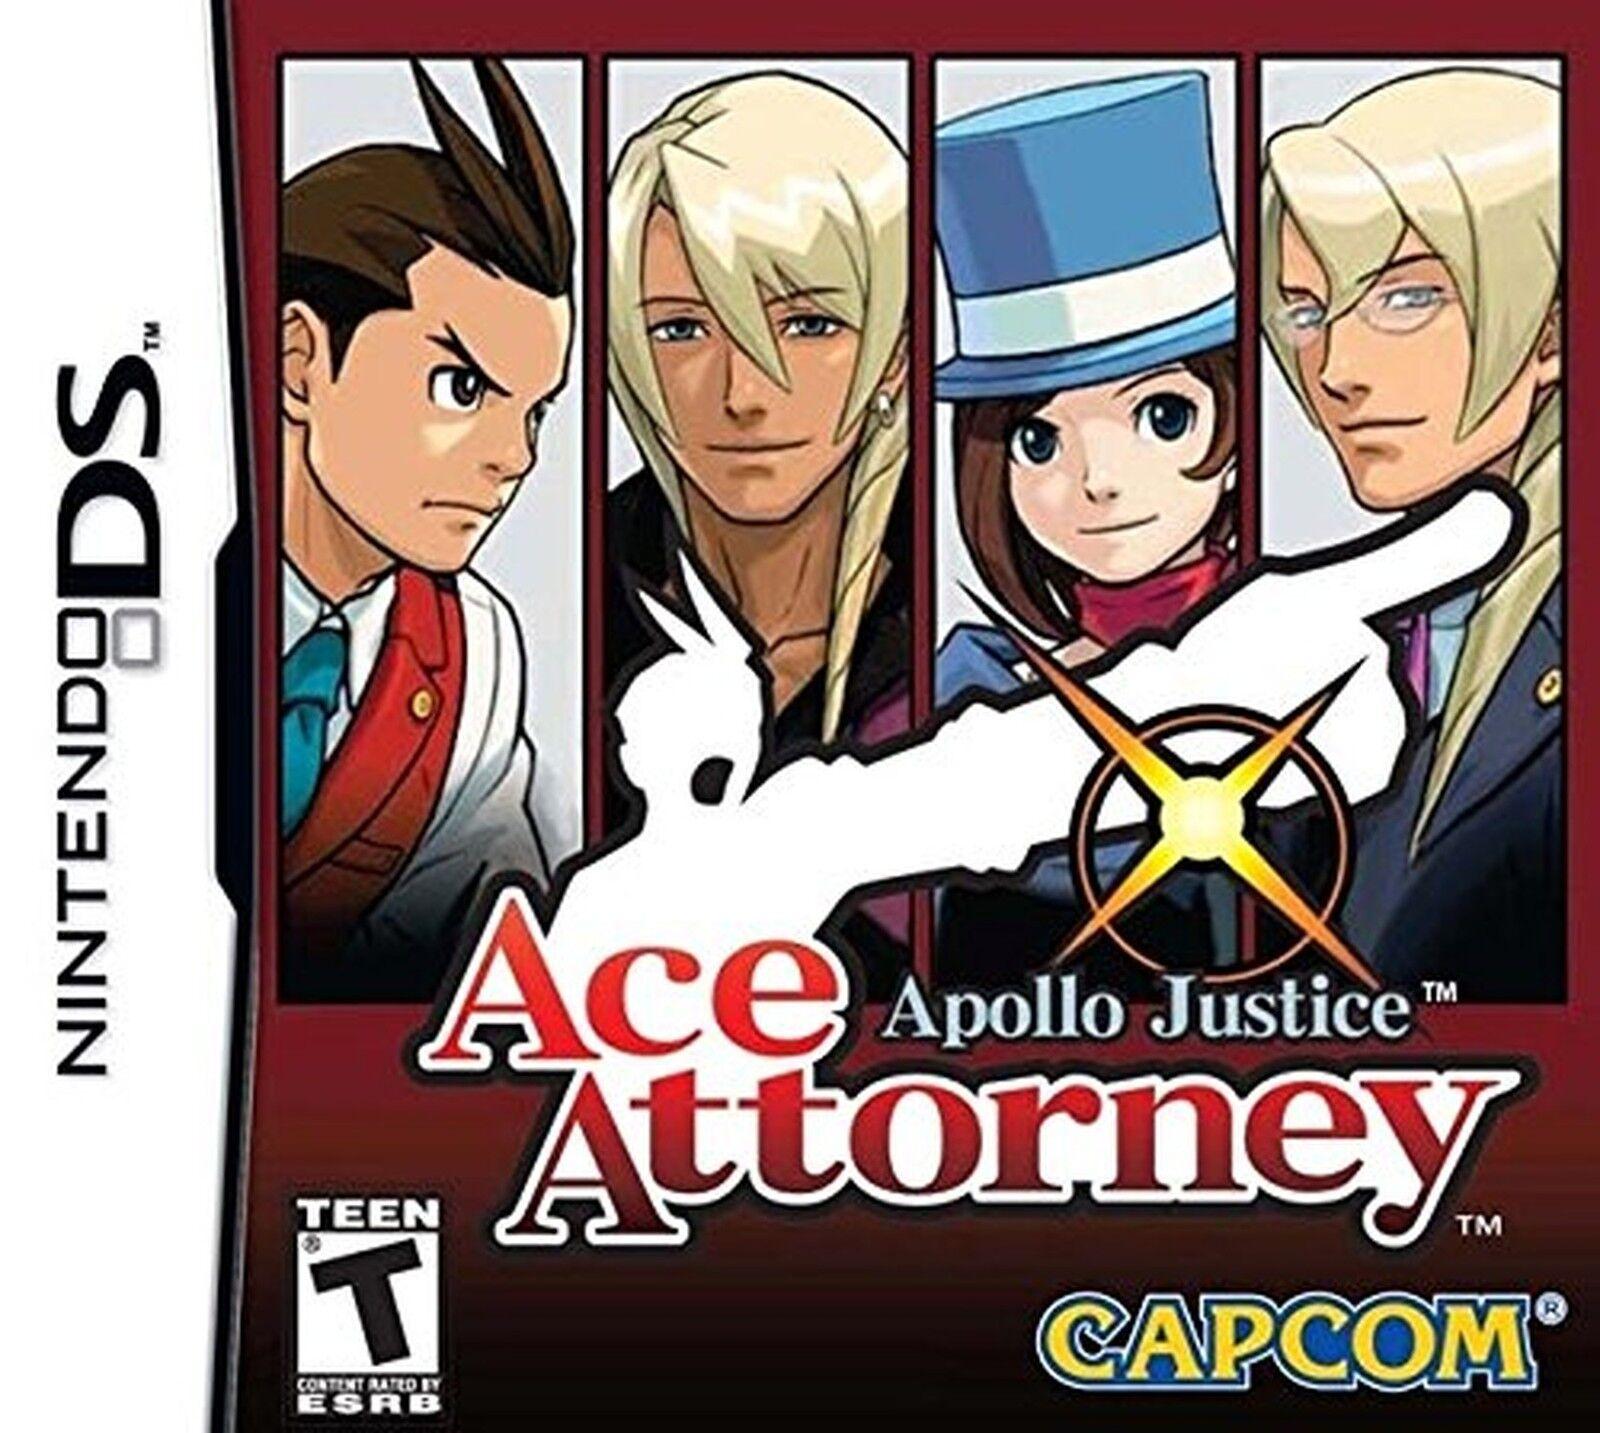 Apollo Justice: Ace Attorney (Nintendo DS, 2008) 1